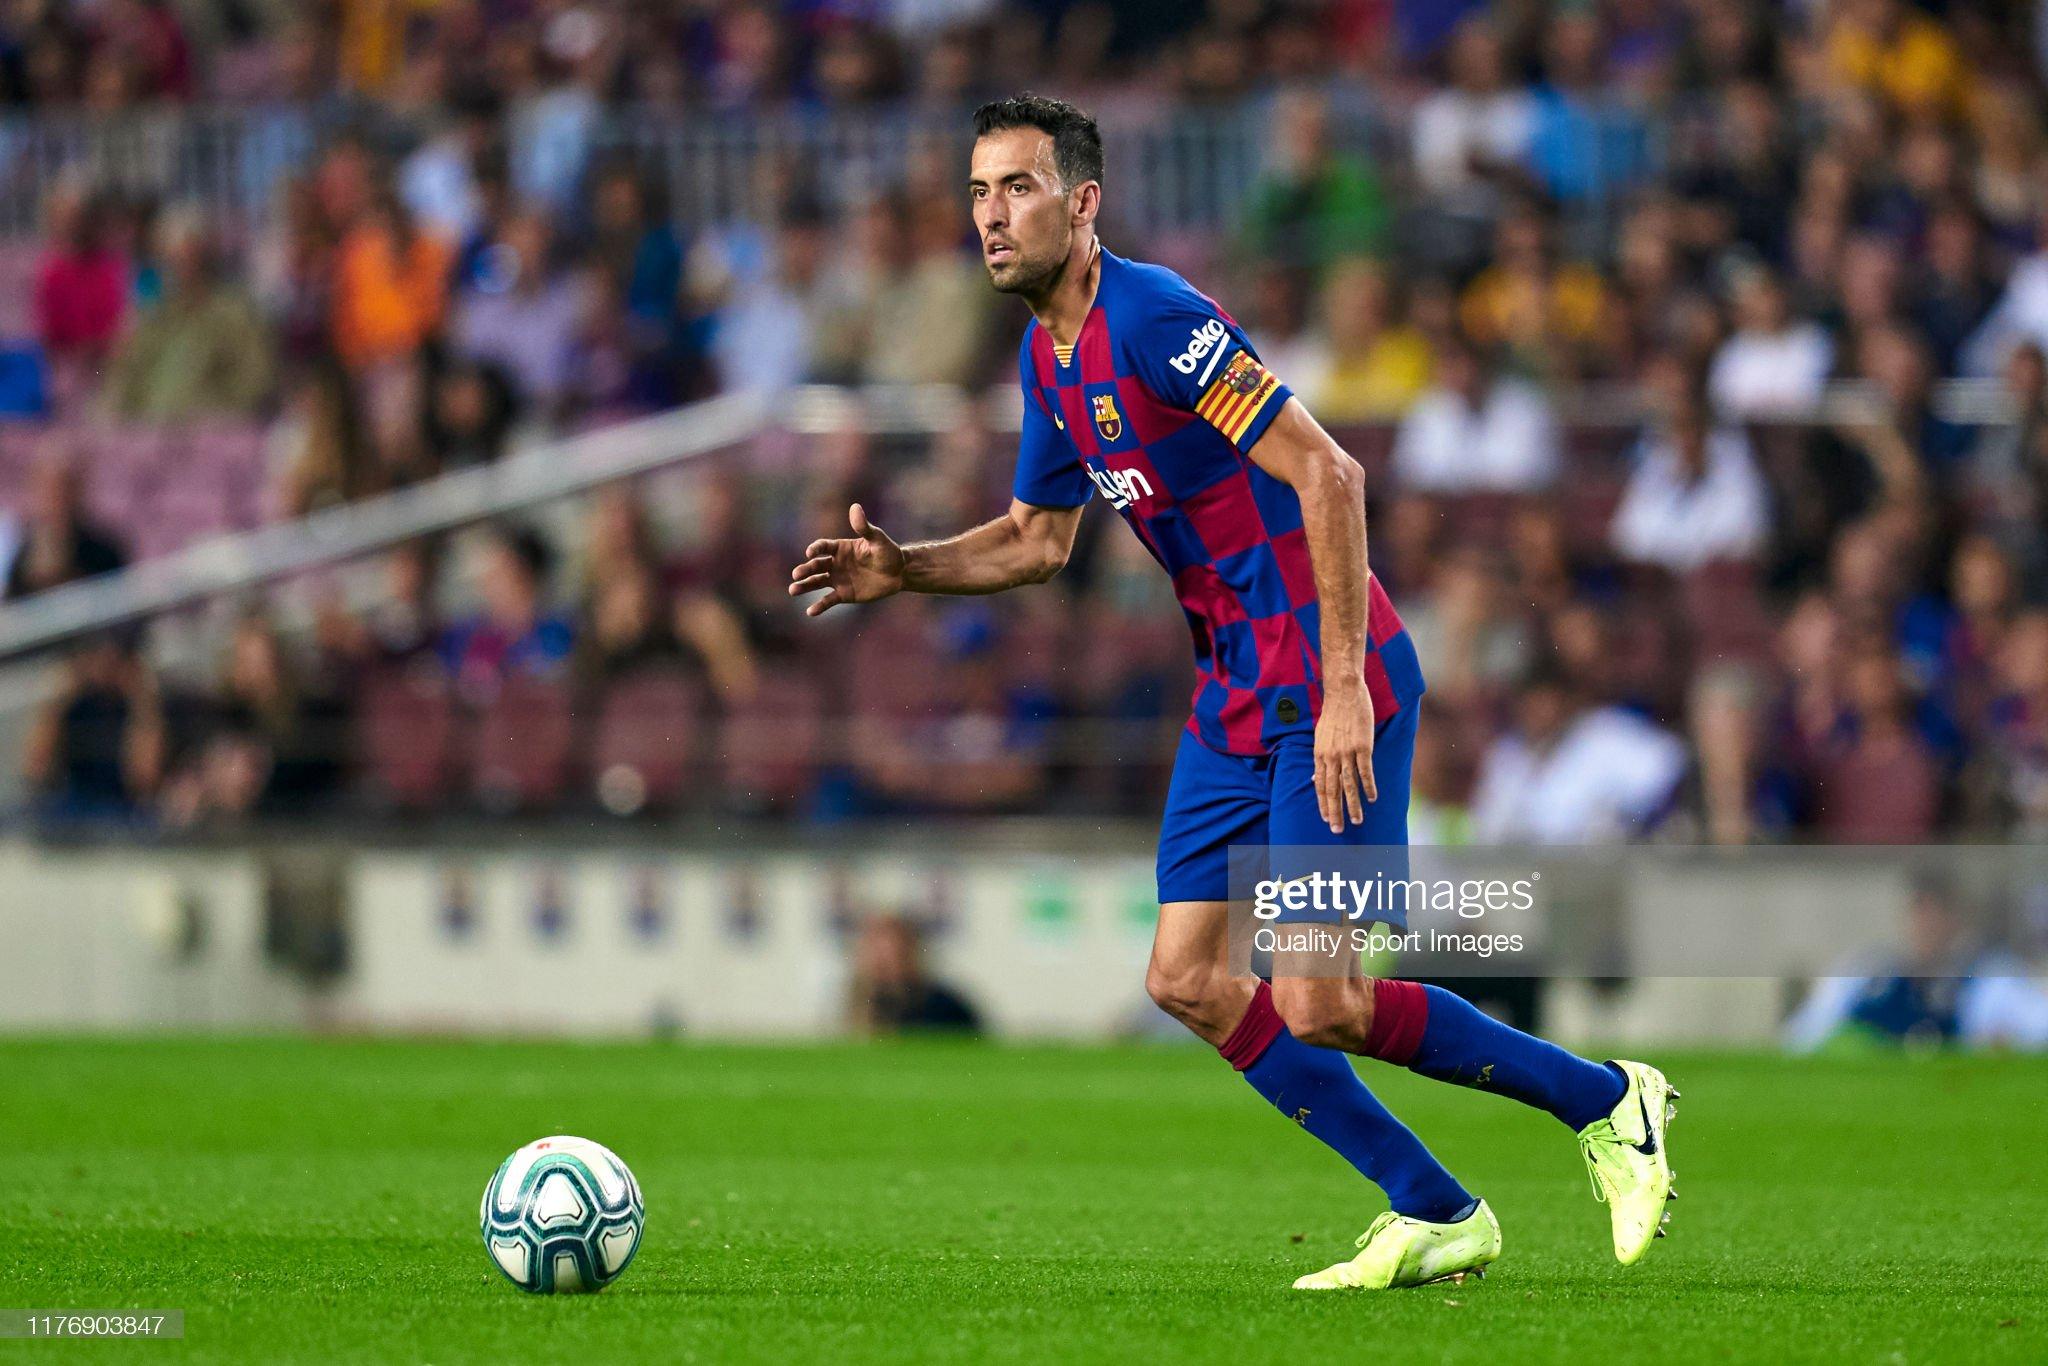 صور مباراة : برشلونة - فياريال 2-1 ( 24-09-2019 )  Sergio-busquets-of-fc-barcelona-with-the-ball-during-the-liga-match-picture-id1176903847?s=2048x2048